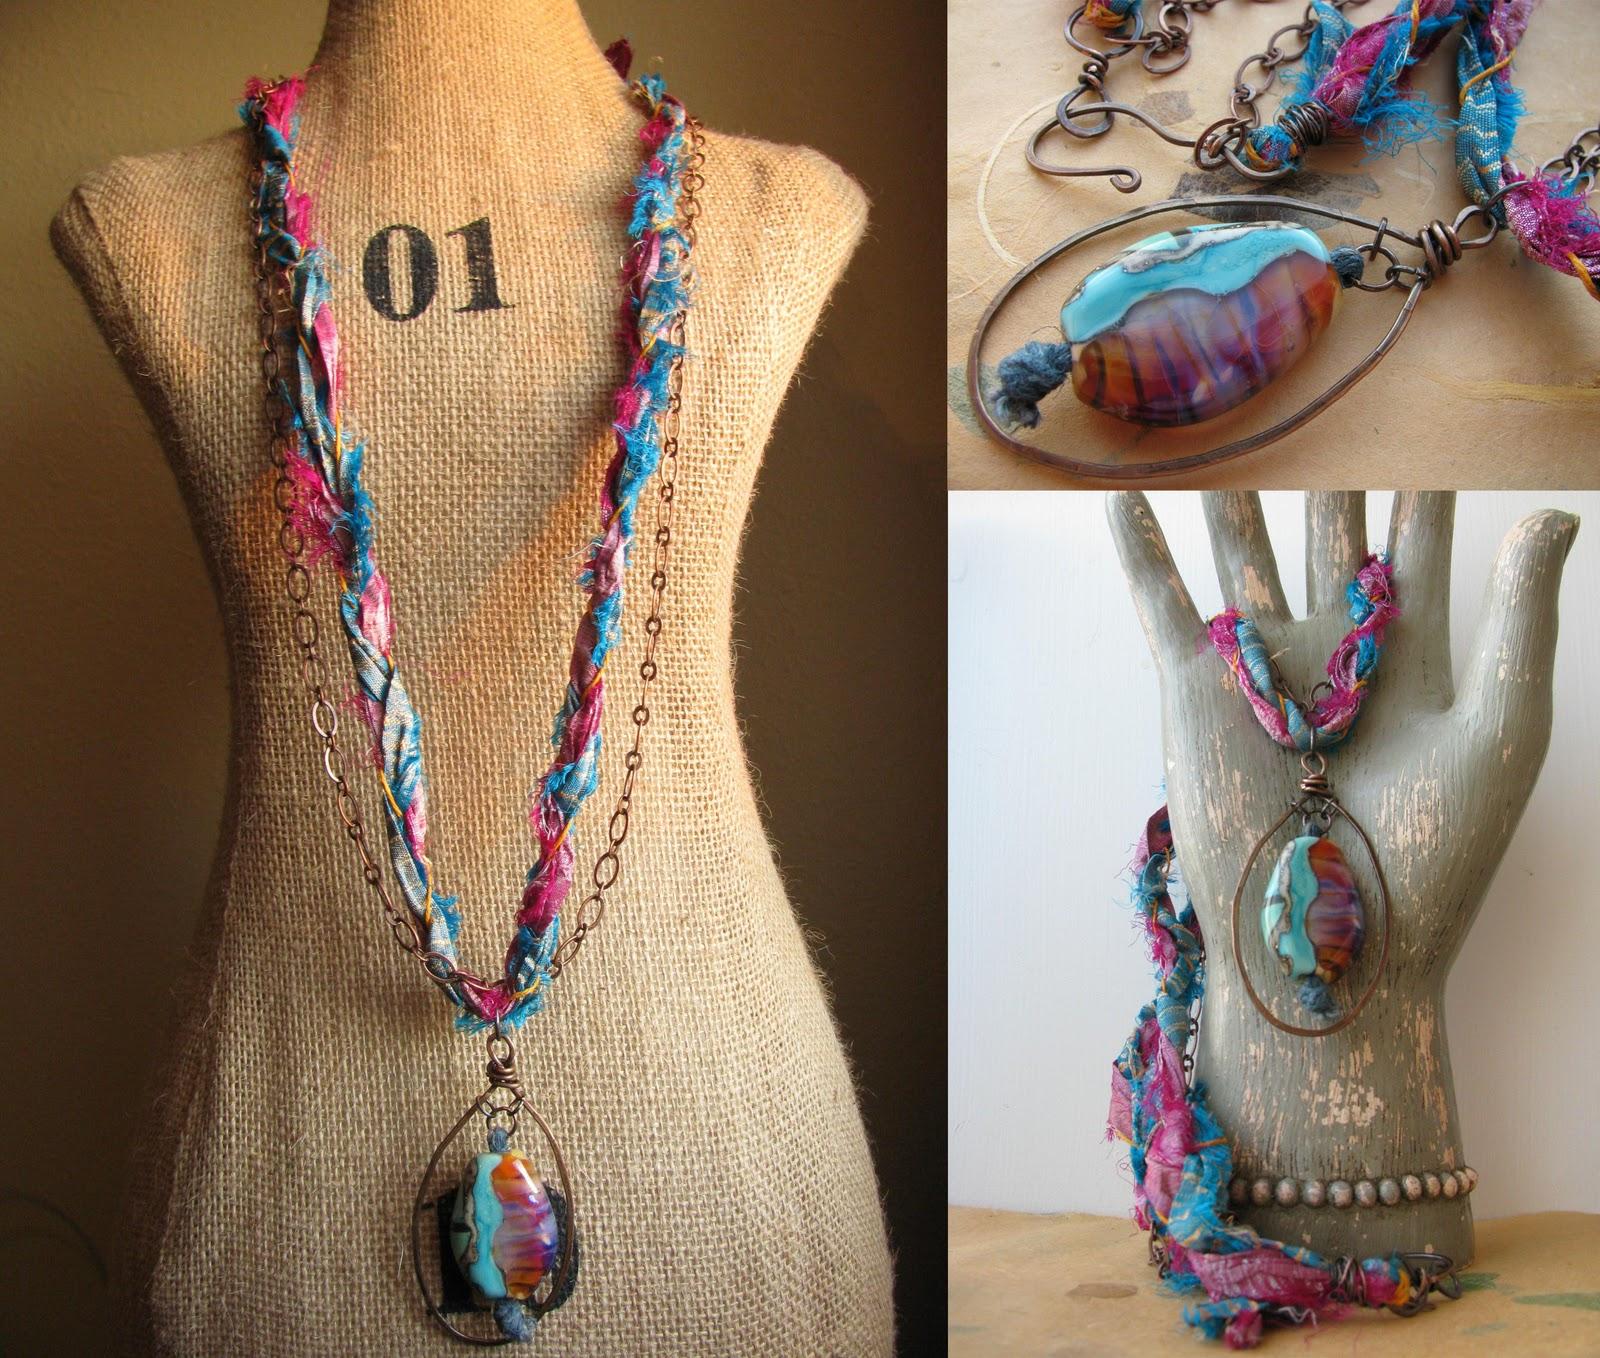 Ex Post Facto Jewelry: October 2011